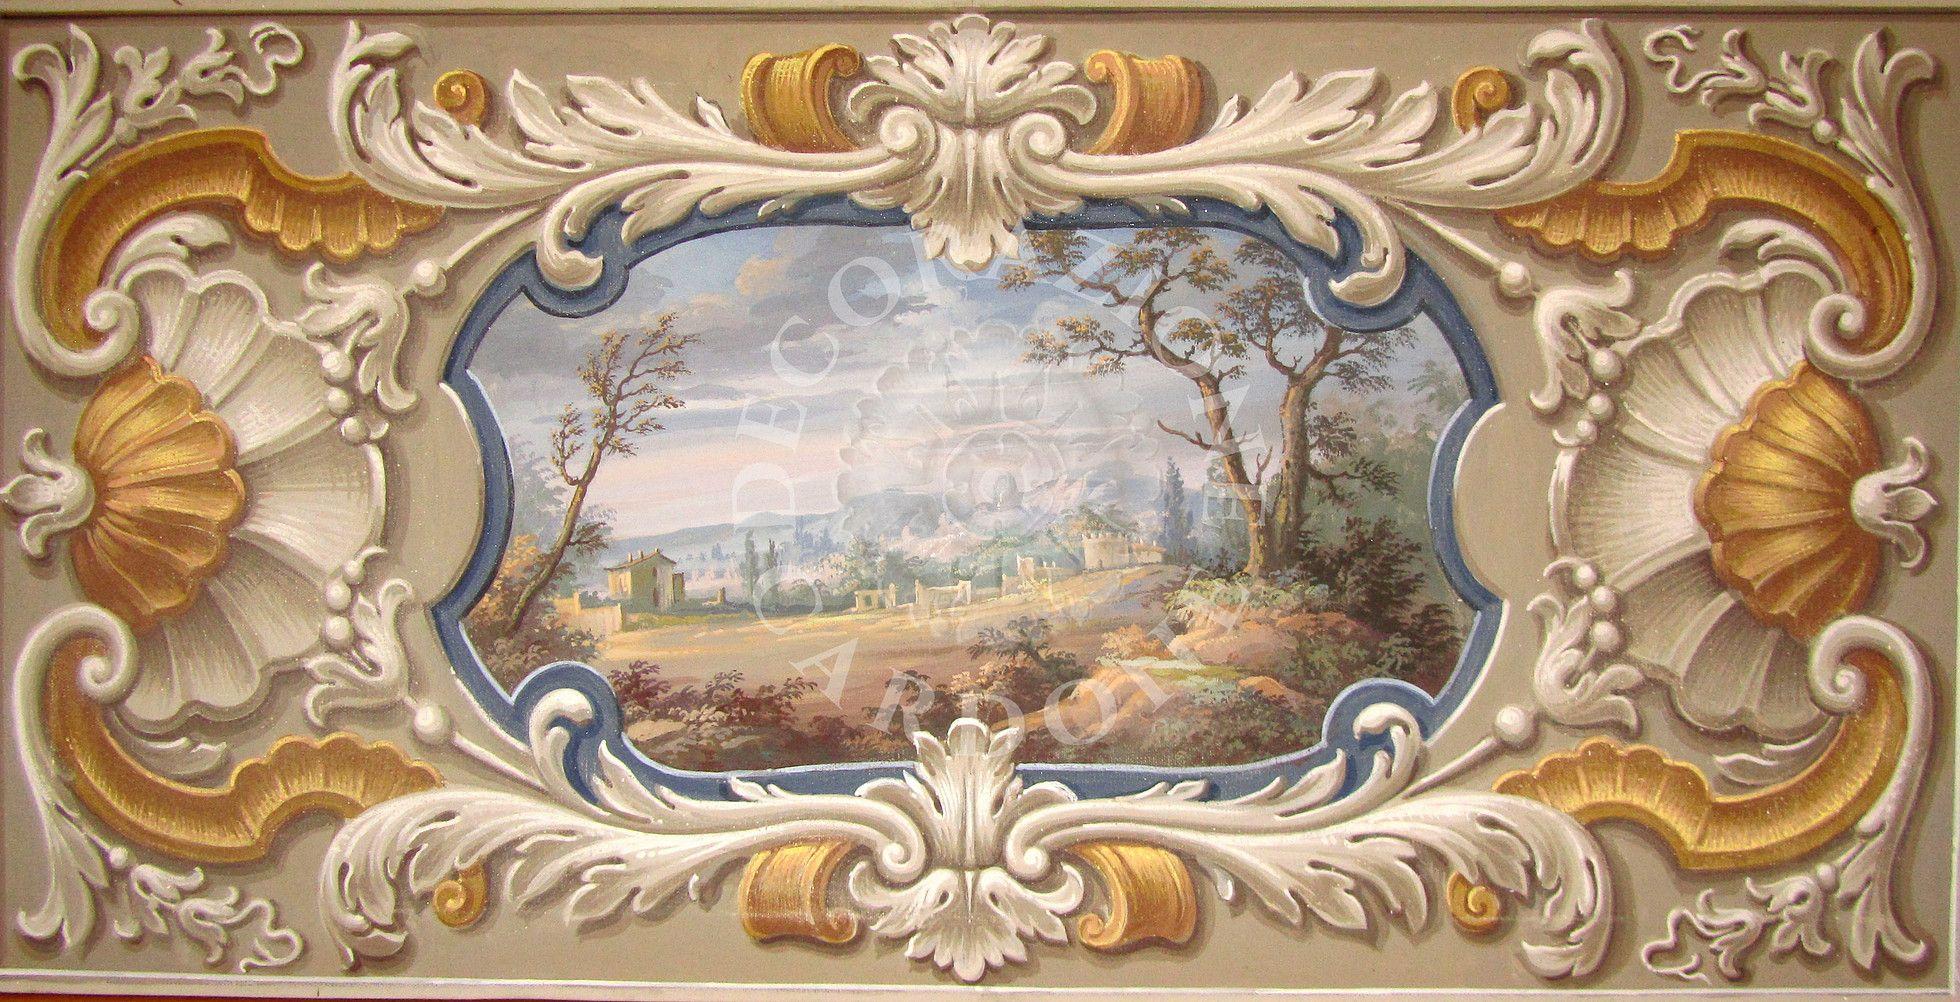 PANNELLI DECORATIVI | Decorazioni, Pitture murali ...